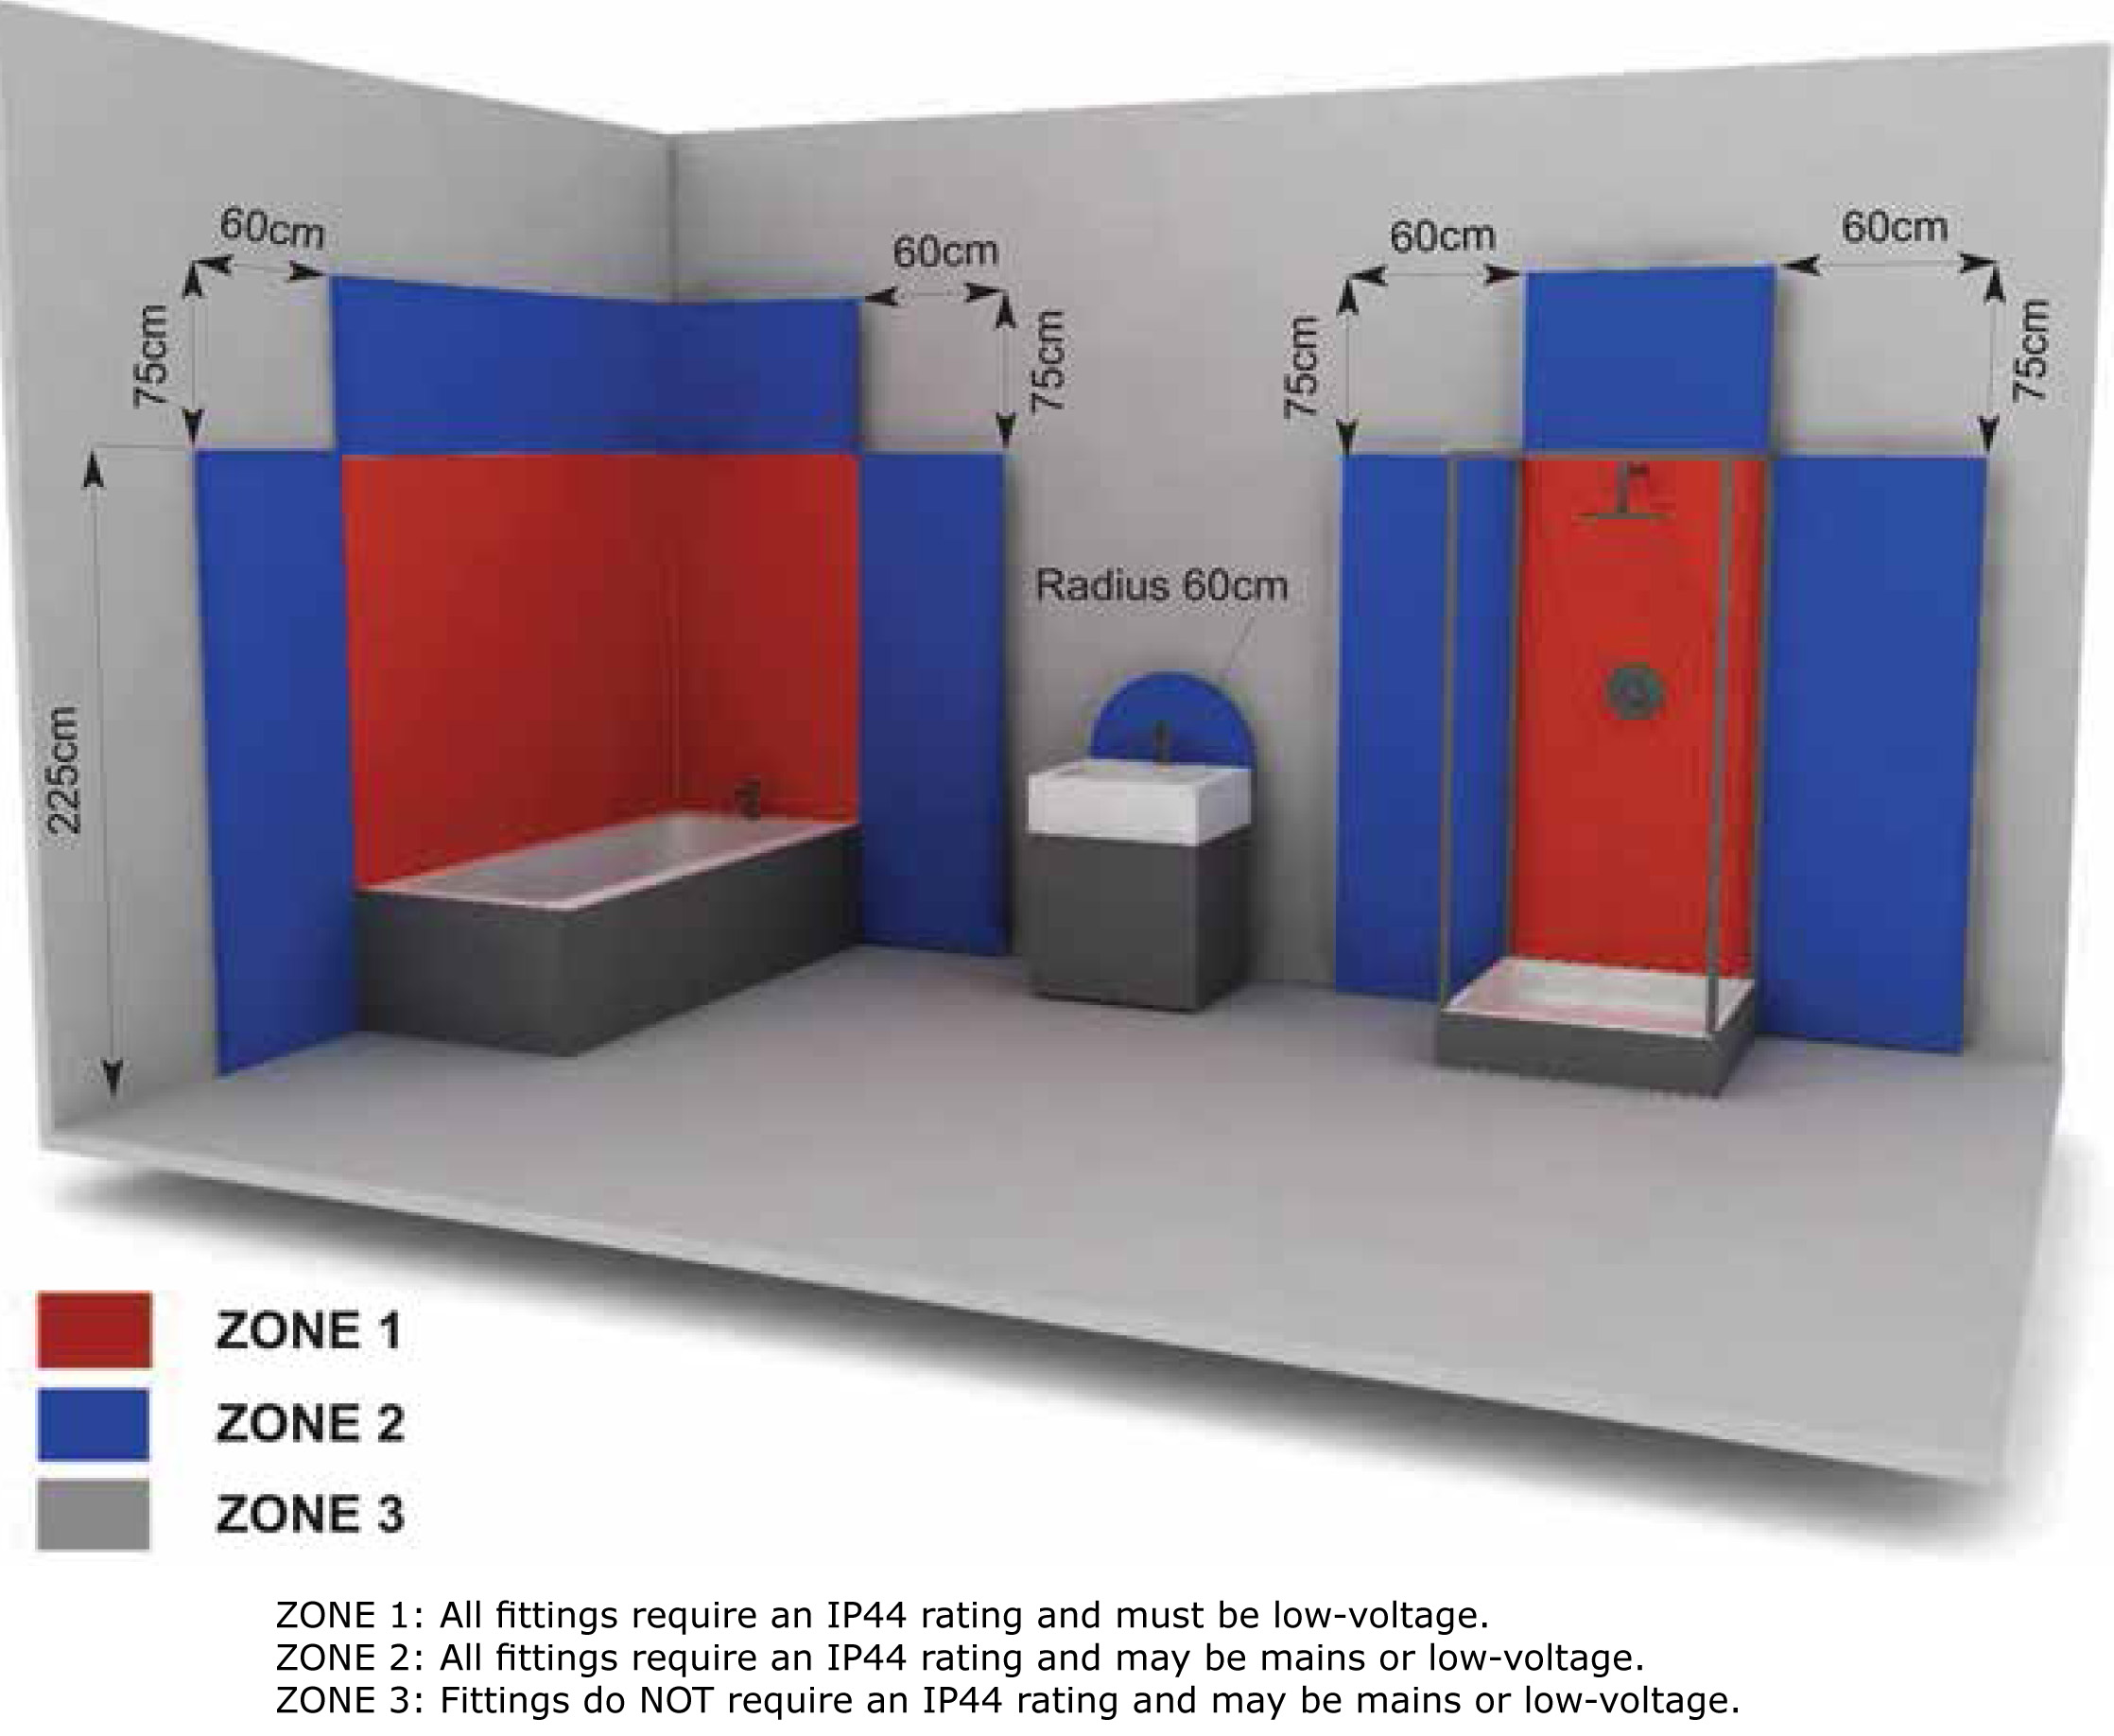 UK & European Bathroom Zones. Click to Enlarge